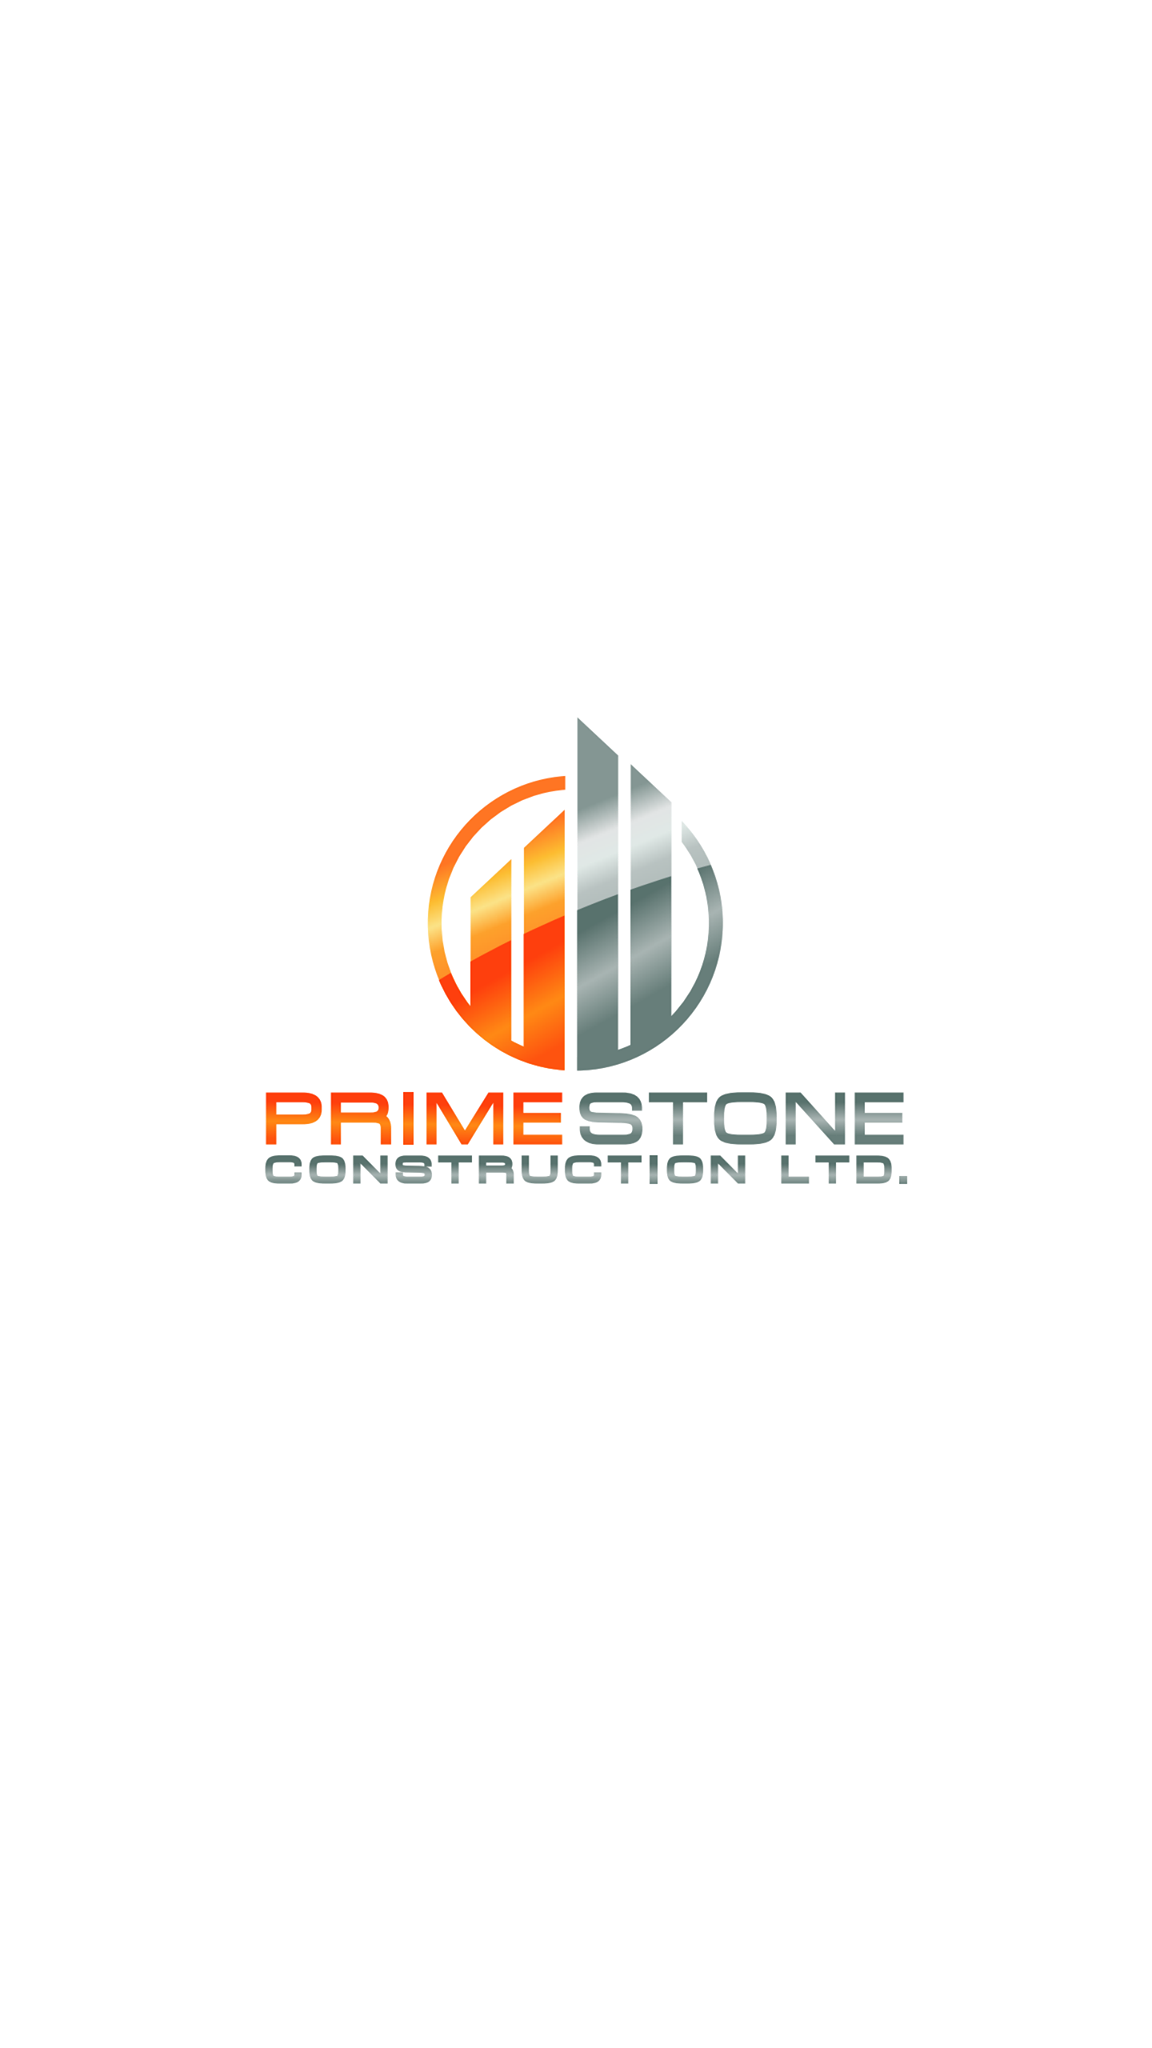 Primestone Construction Ltd logo